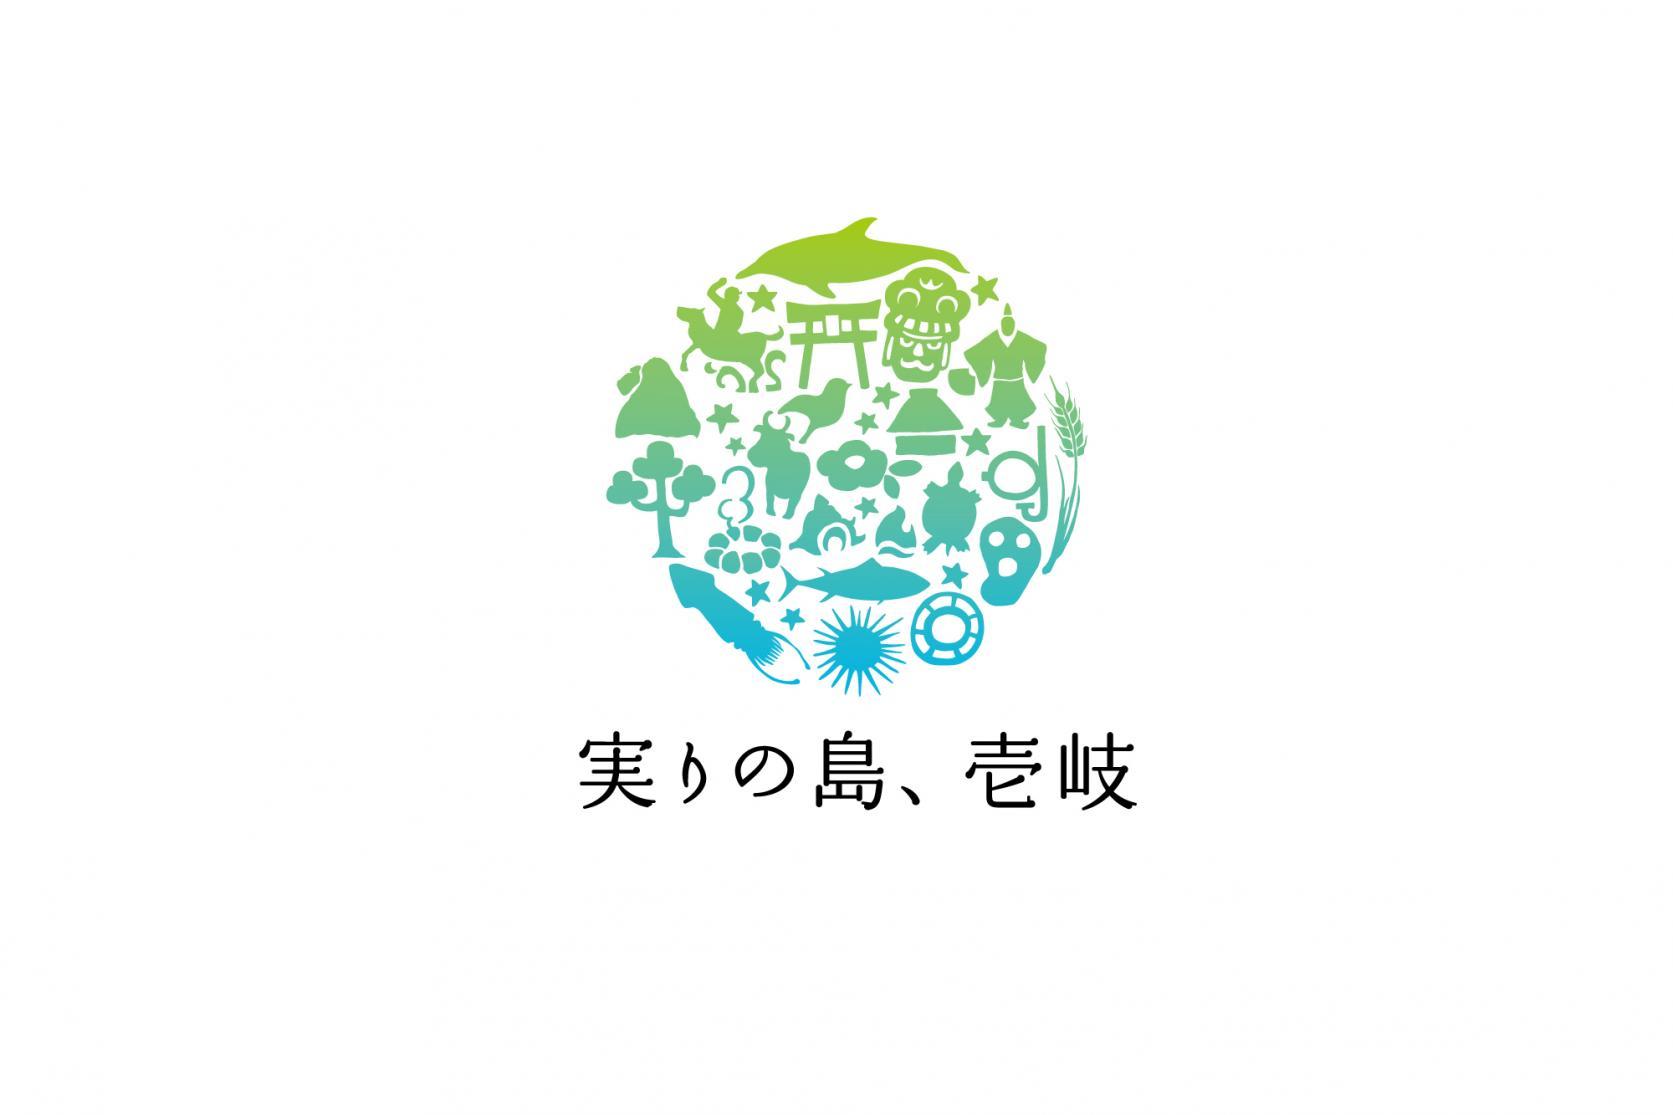 【TV番組放送のお知らせ】NHK-BSプレミアム「にっぽん縦断 こころ旅」 2021春の旅-1